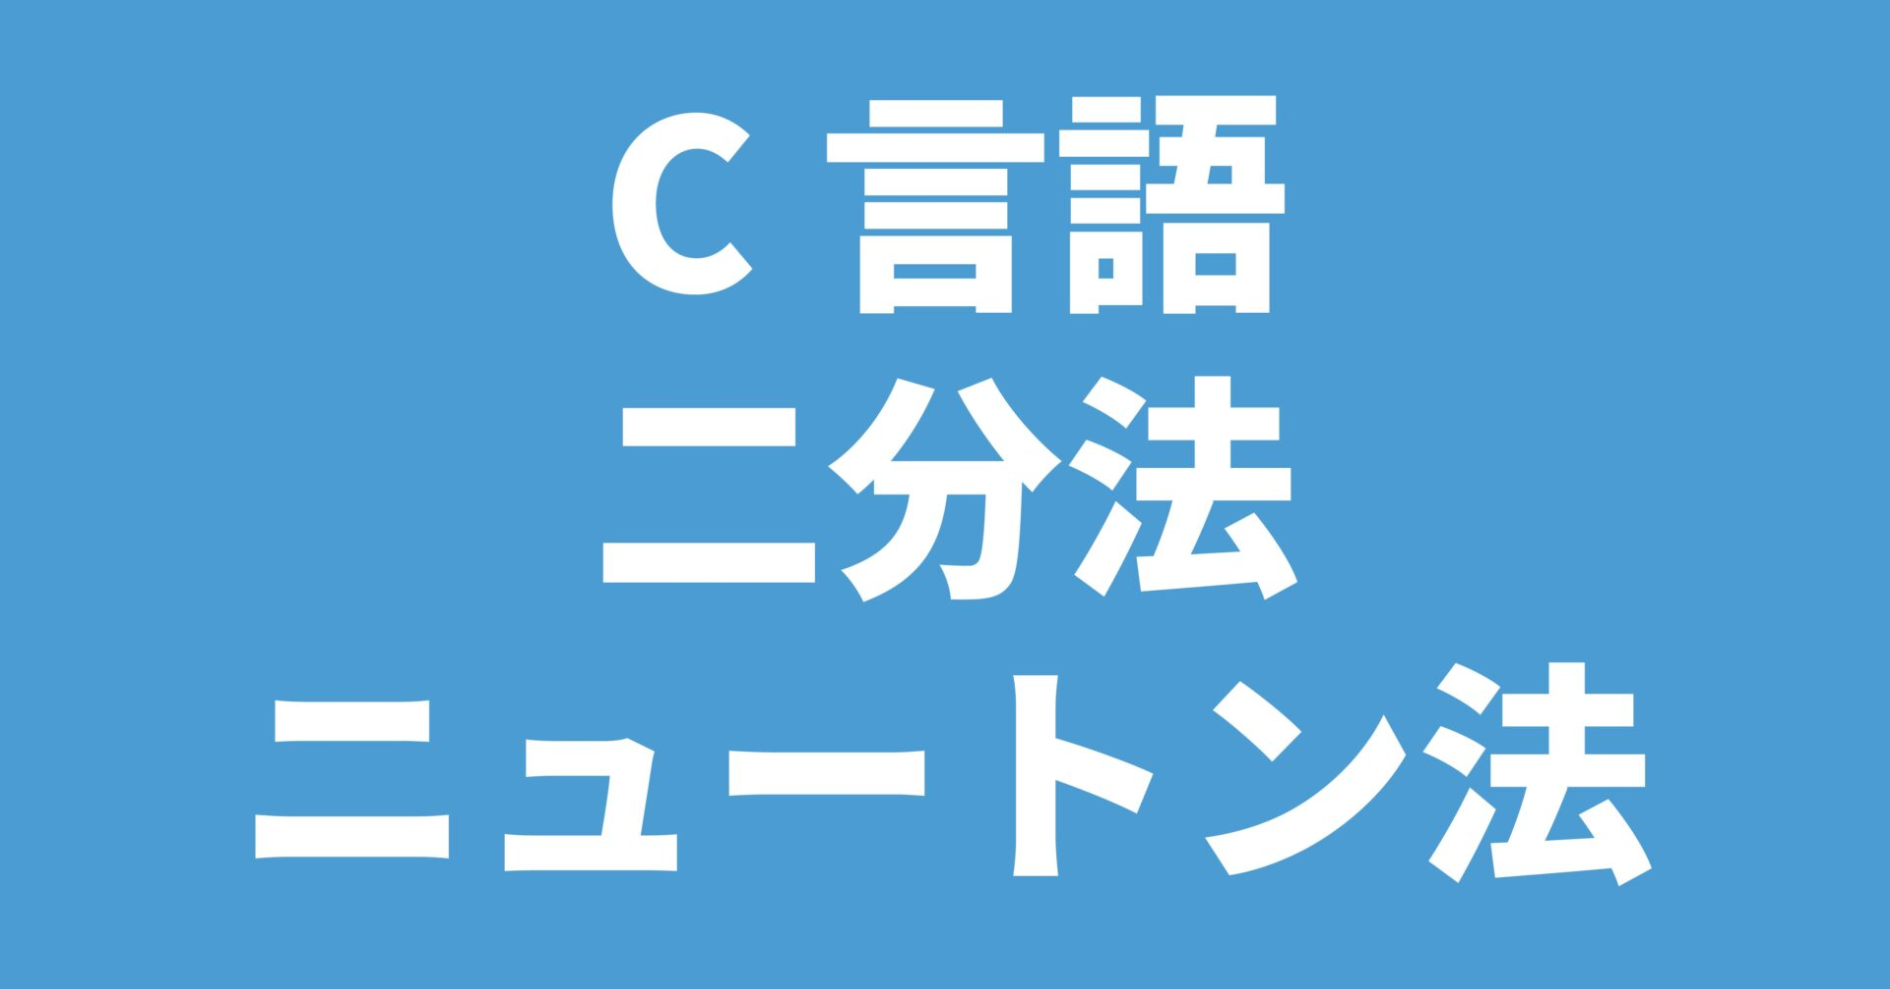 C言語 二分法 ニュートン法